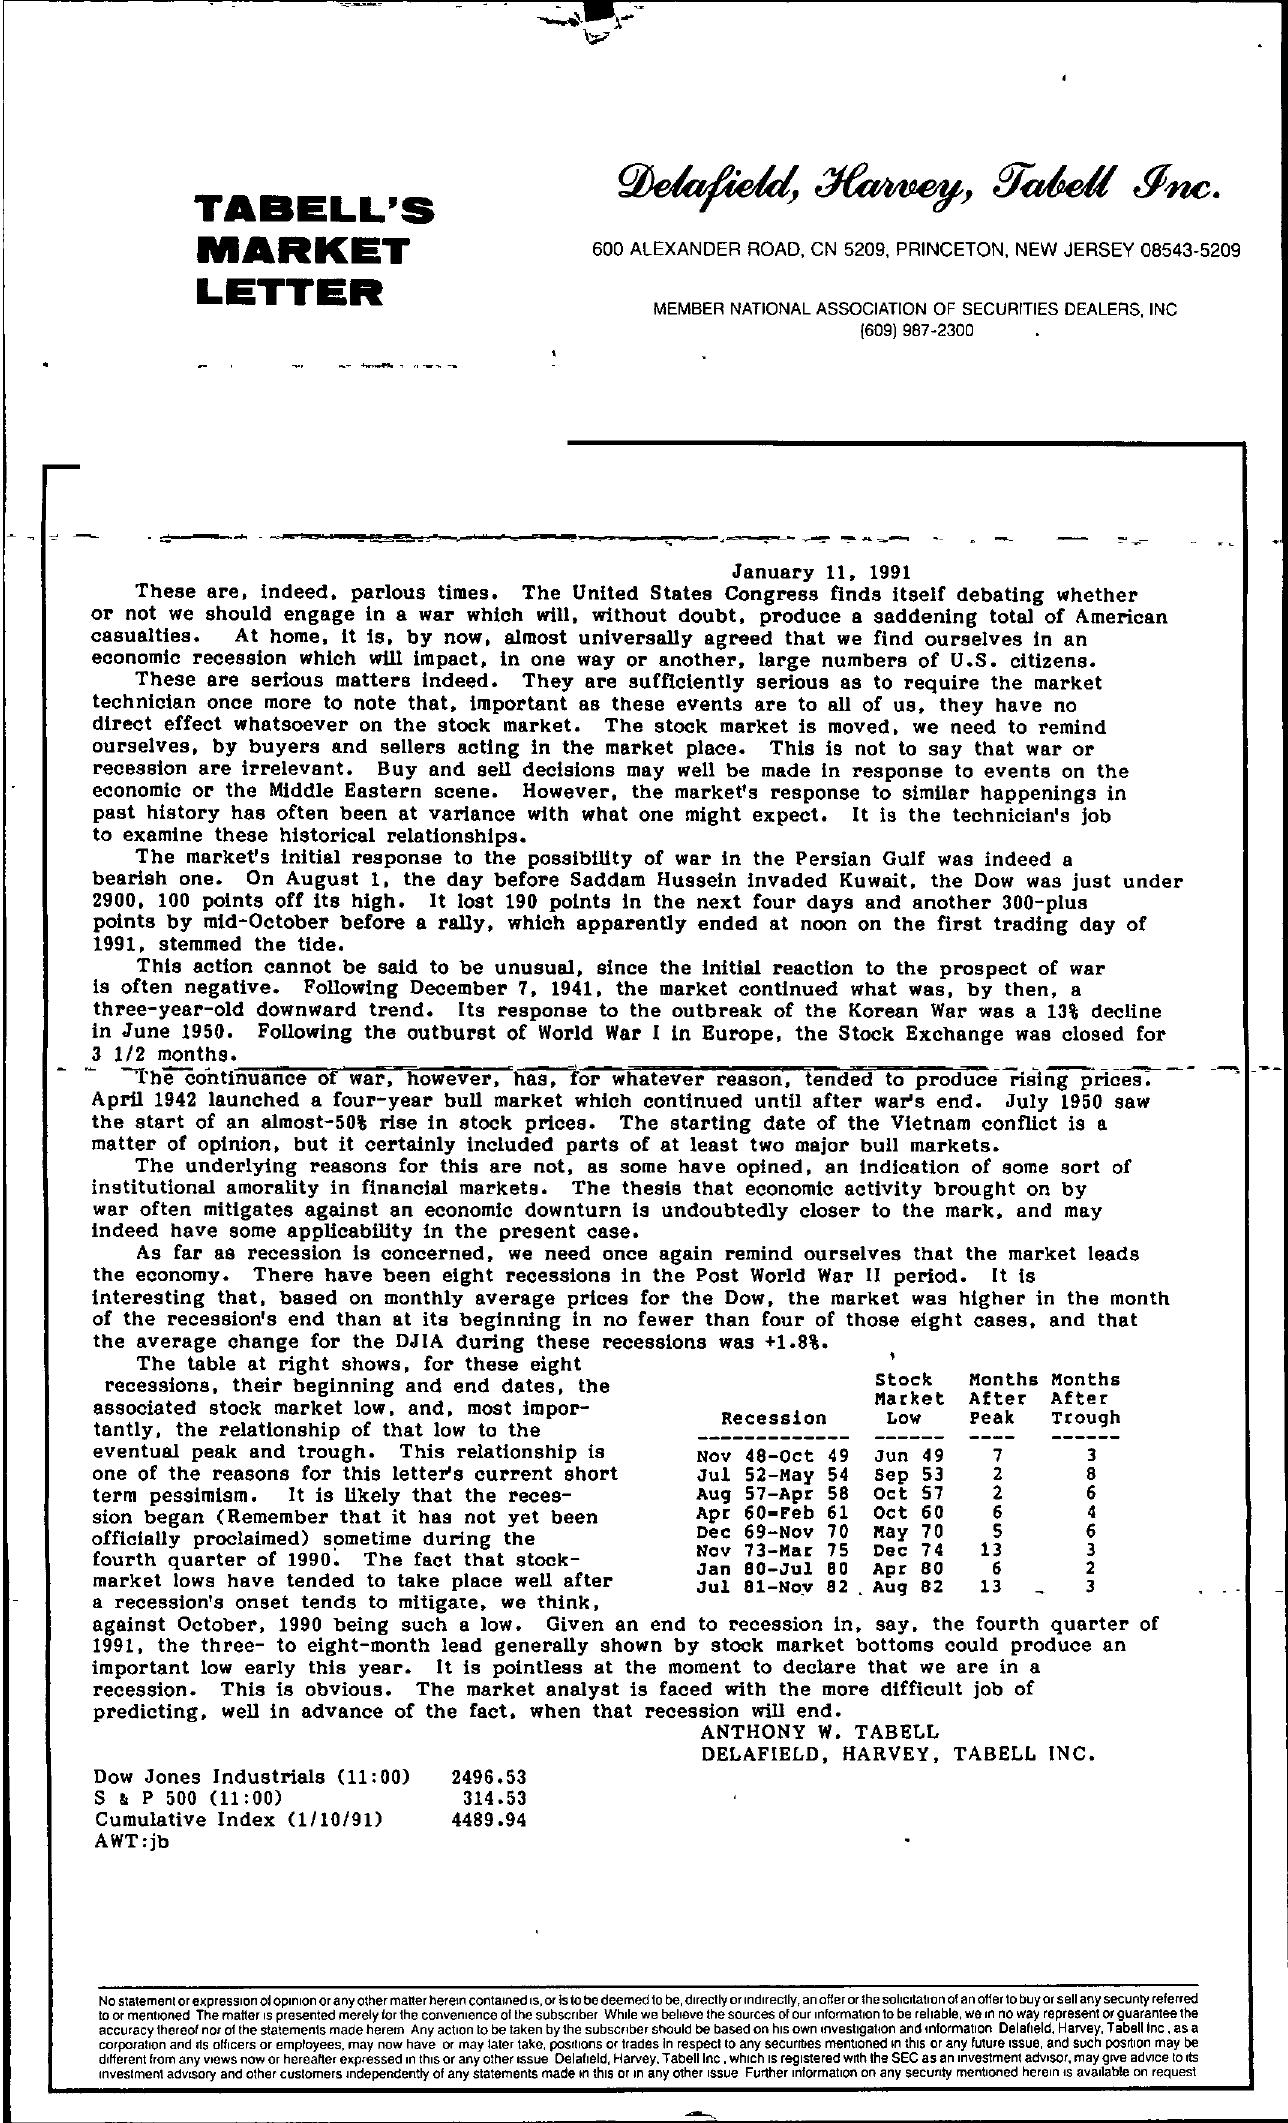 Tabell's Market Letter - January 11, 1991